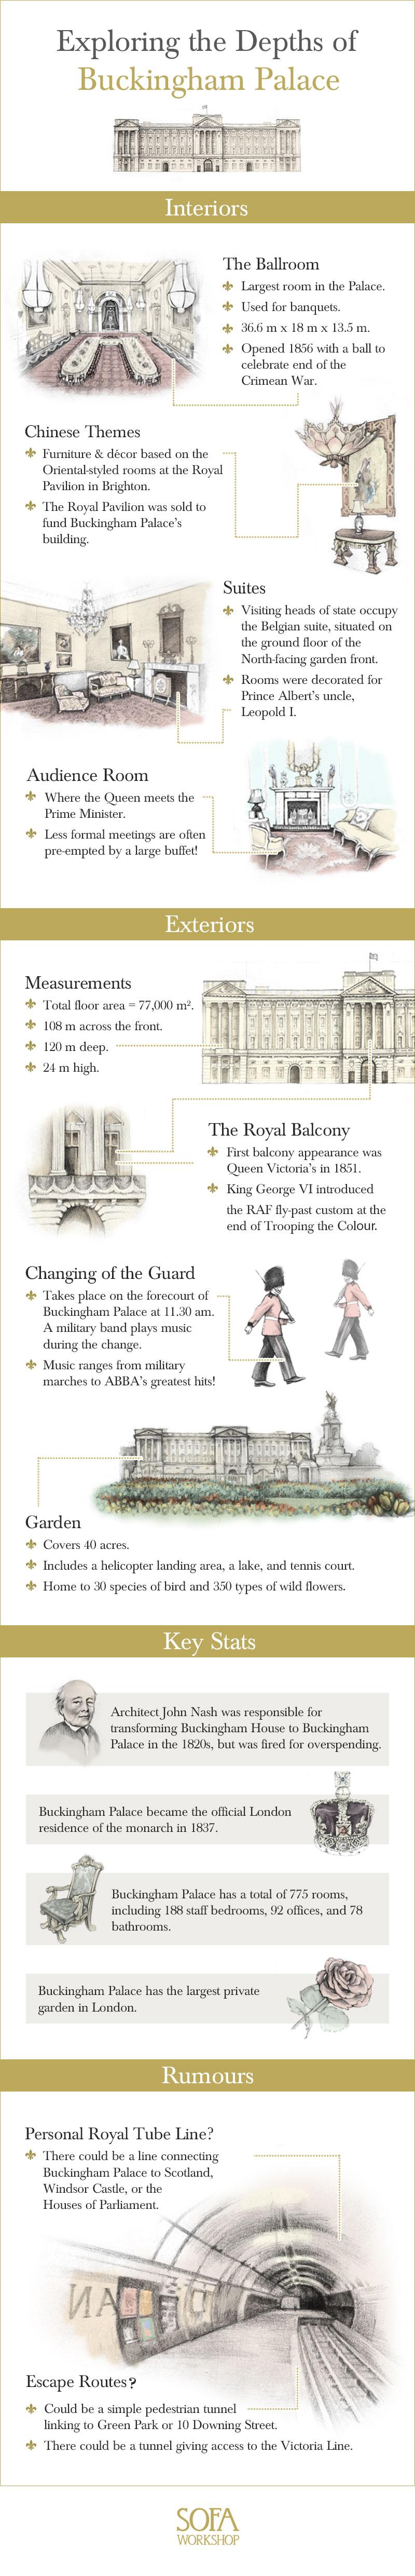 Exploring the Depths of Buckingham Palace